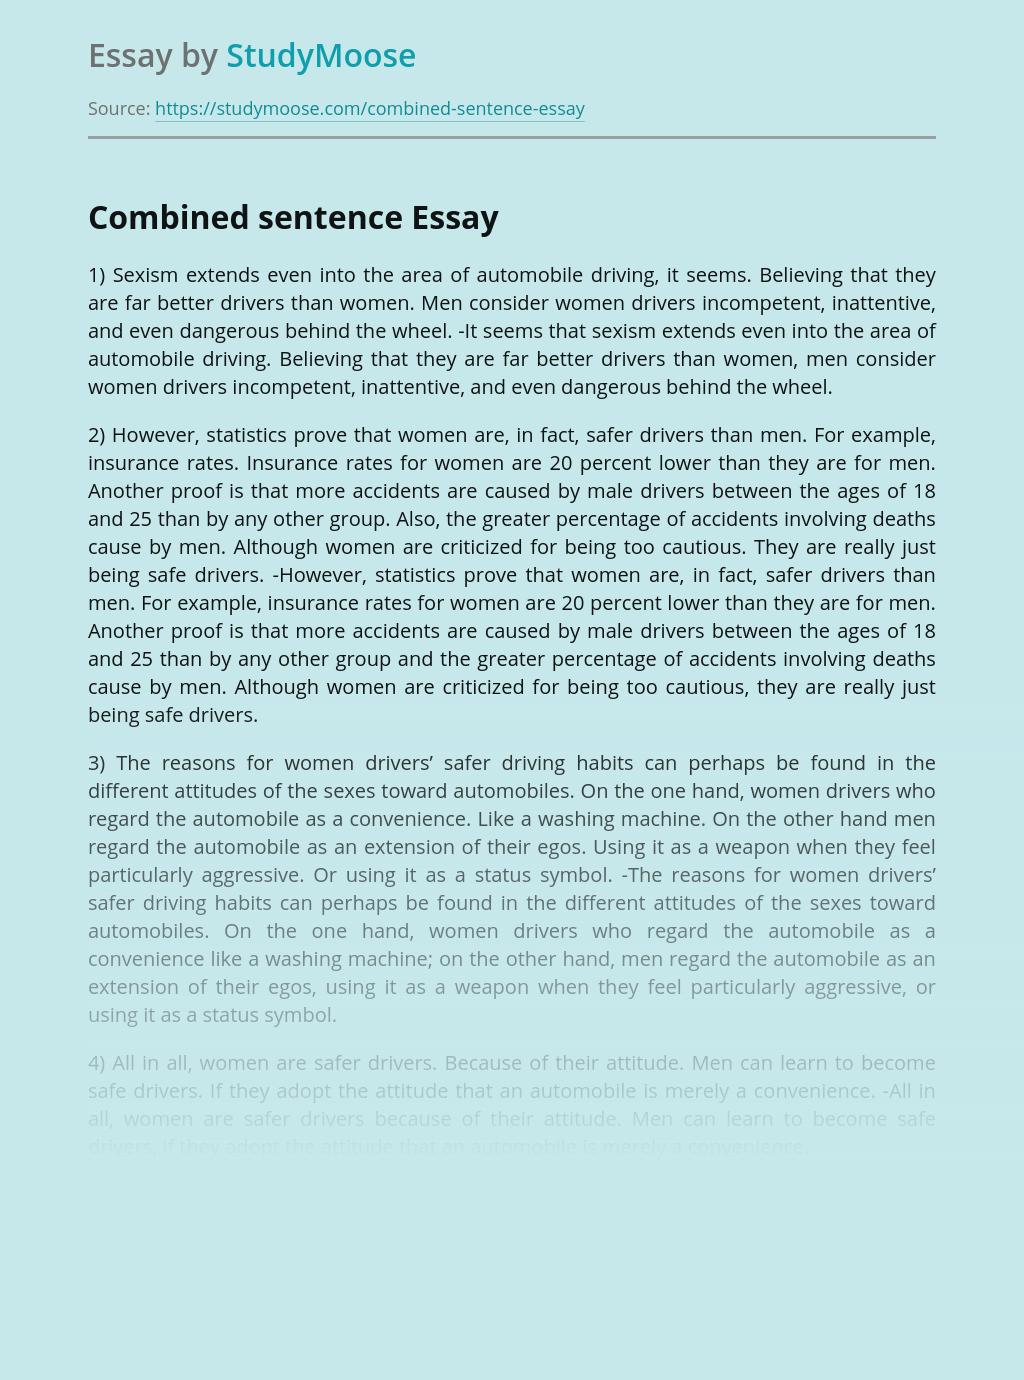 Combined sentence